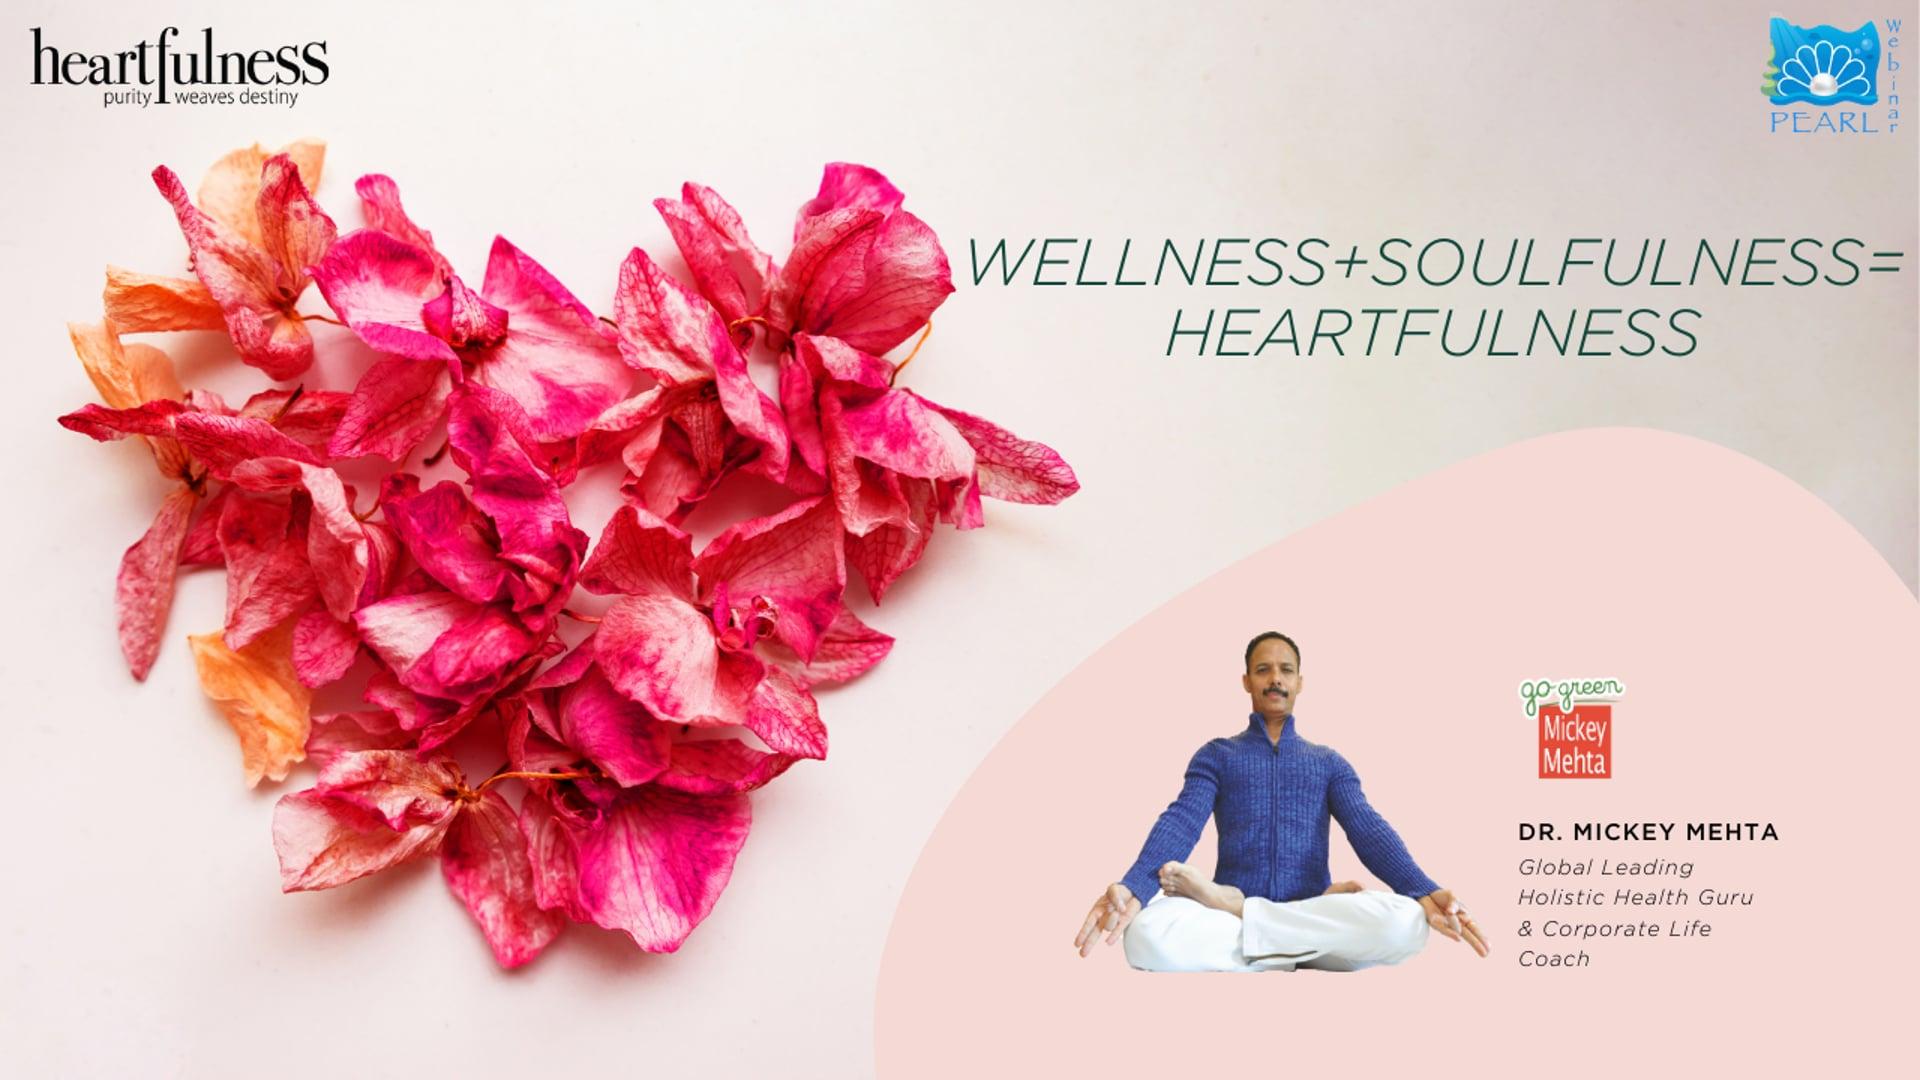 Wellness+Soulfulness=Heartfulness by Dr. Mickey Mehta